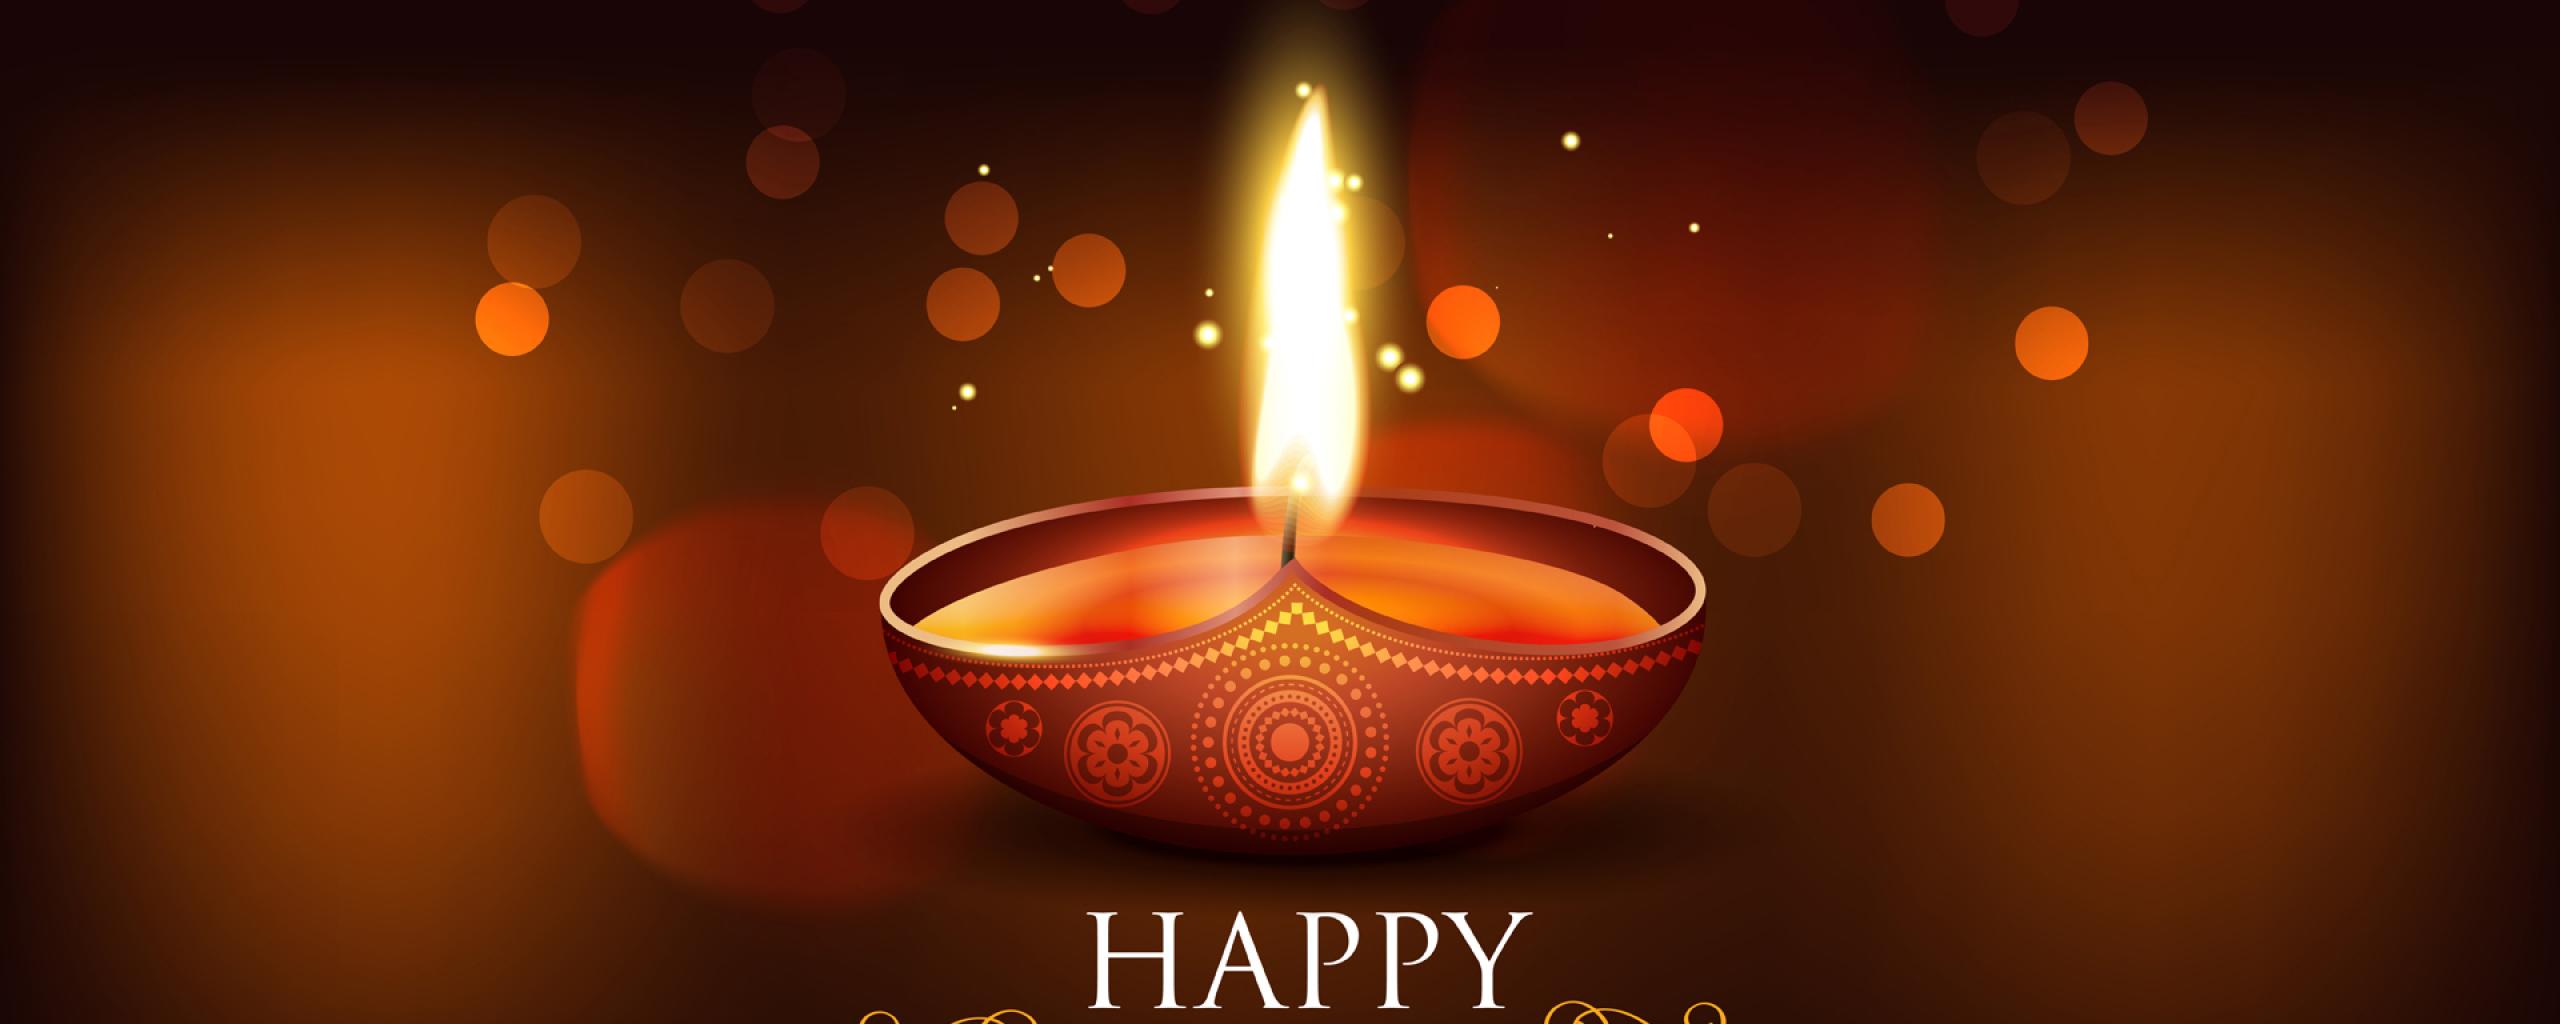 Happy Diwali 2020 Wallpaper in 2560x1024 Resolution